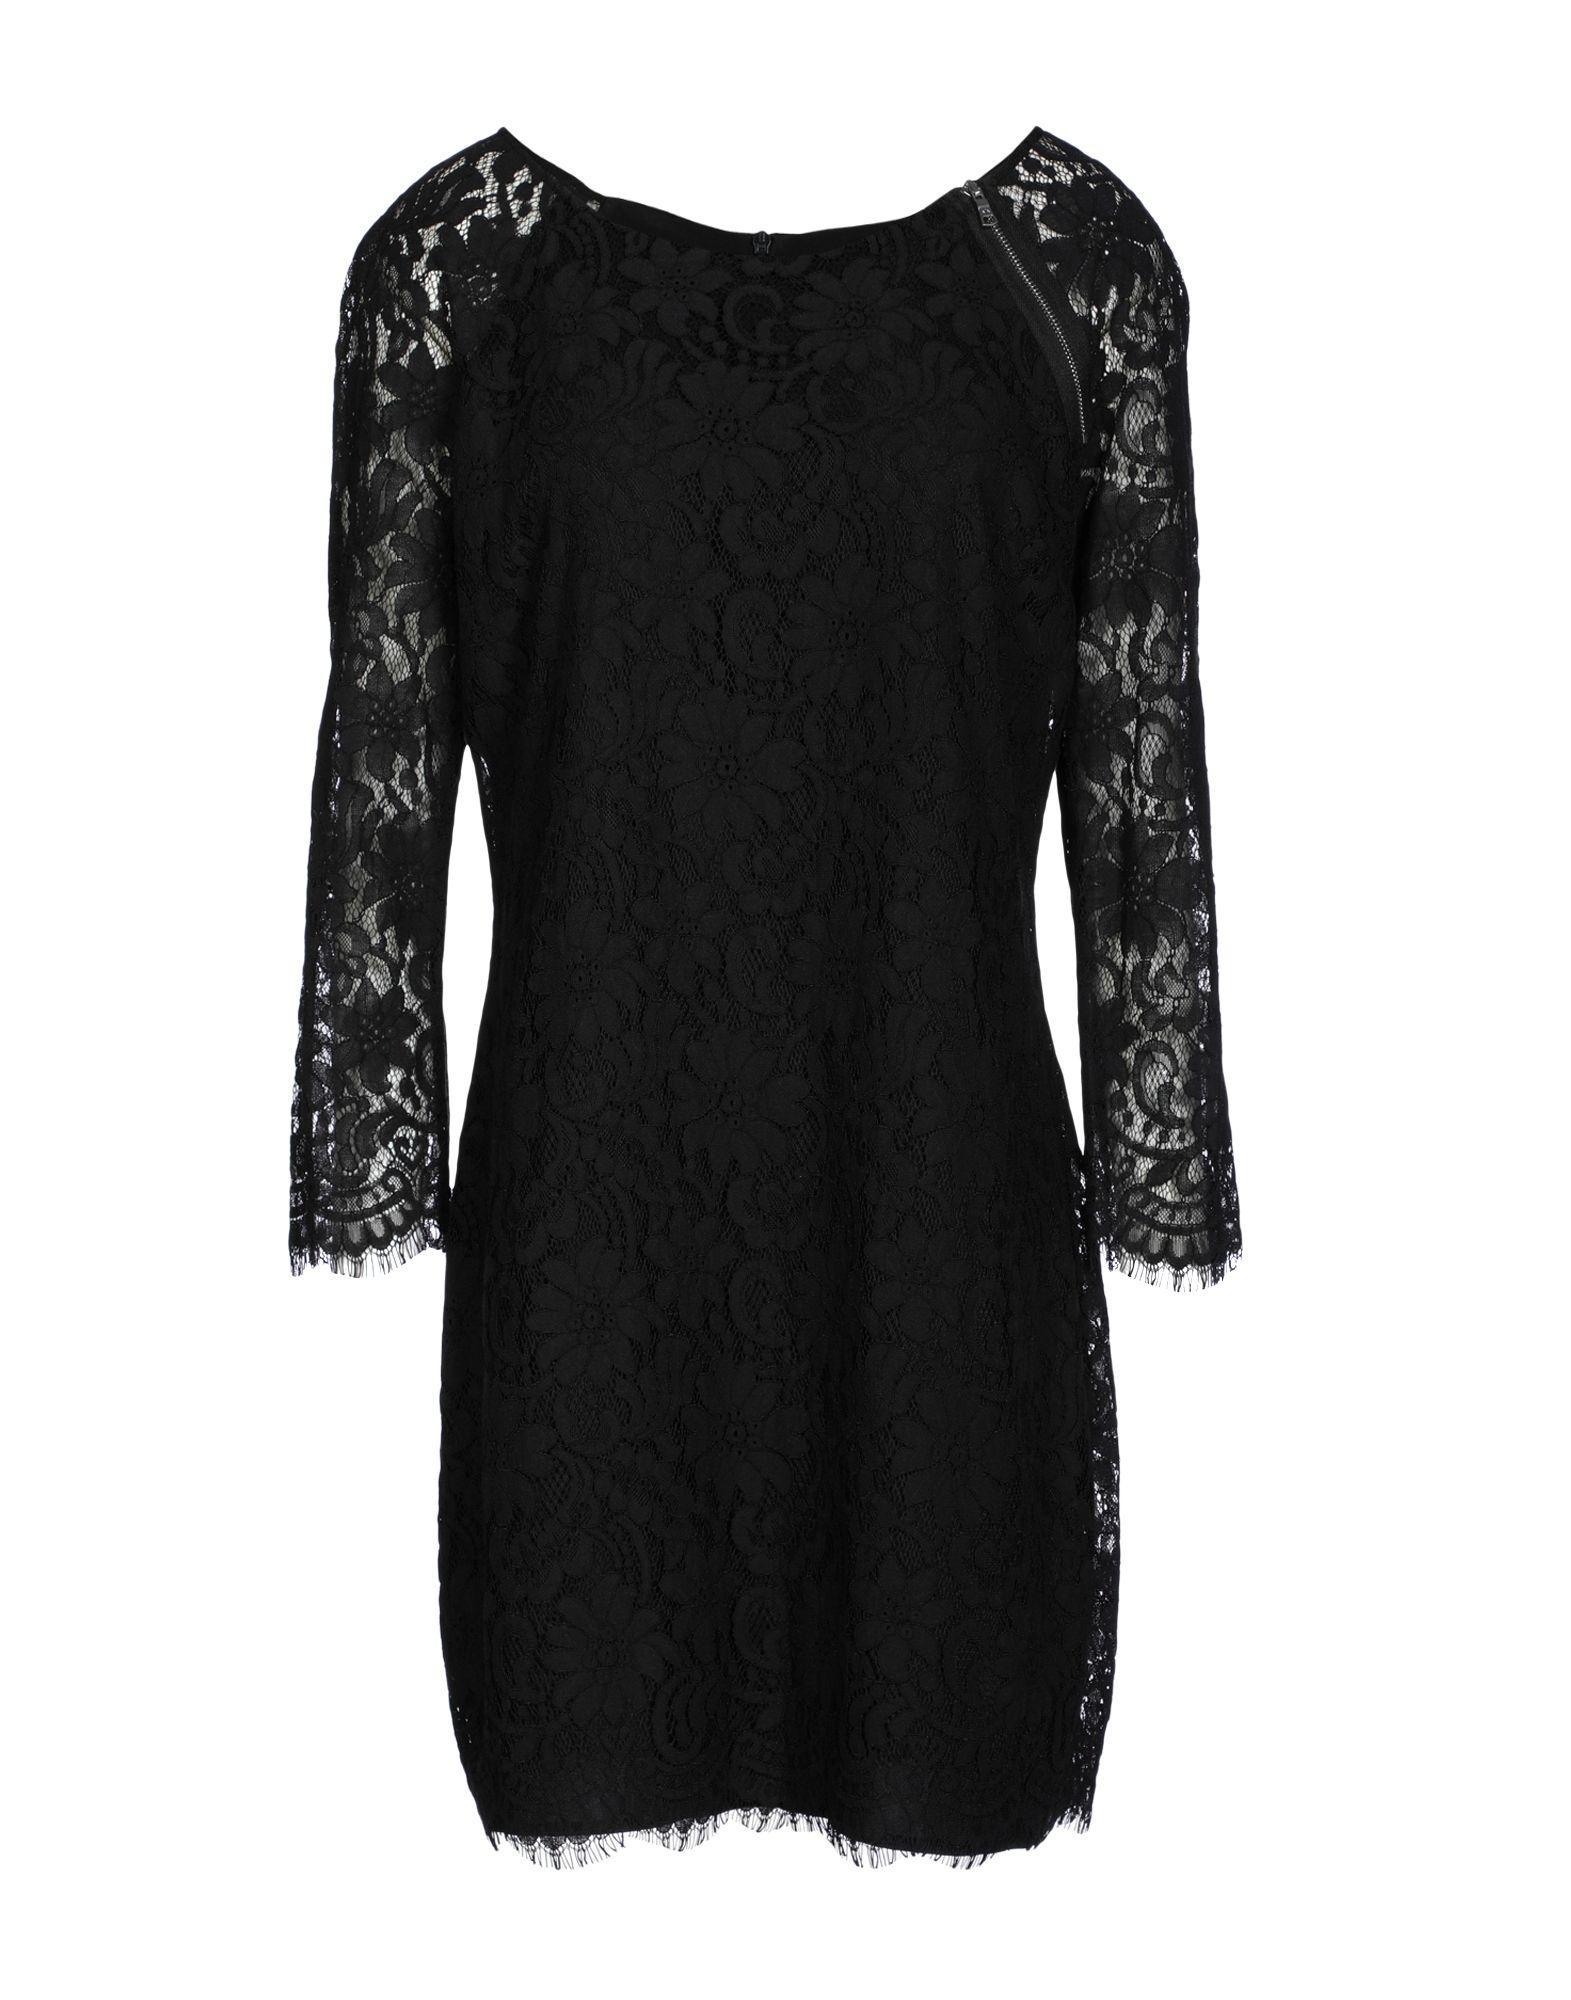 Armani Exchange Short Dresses In Black